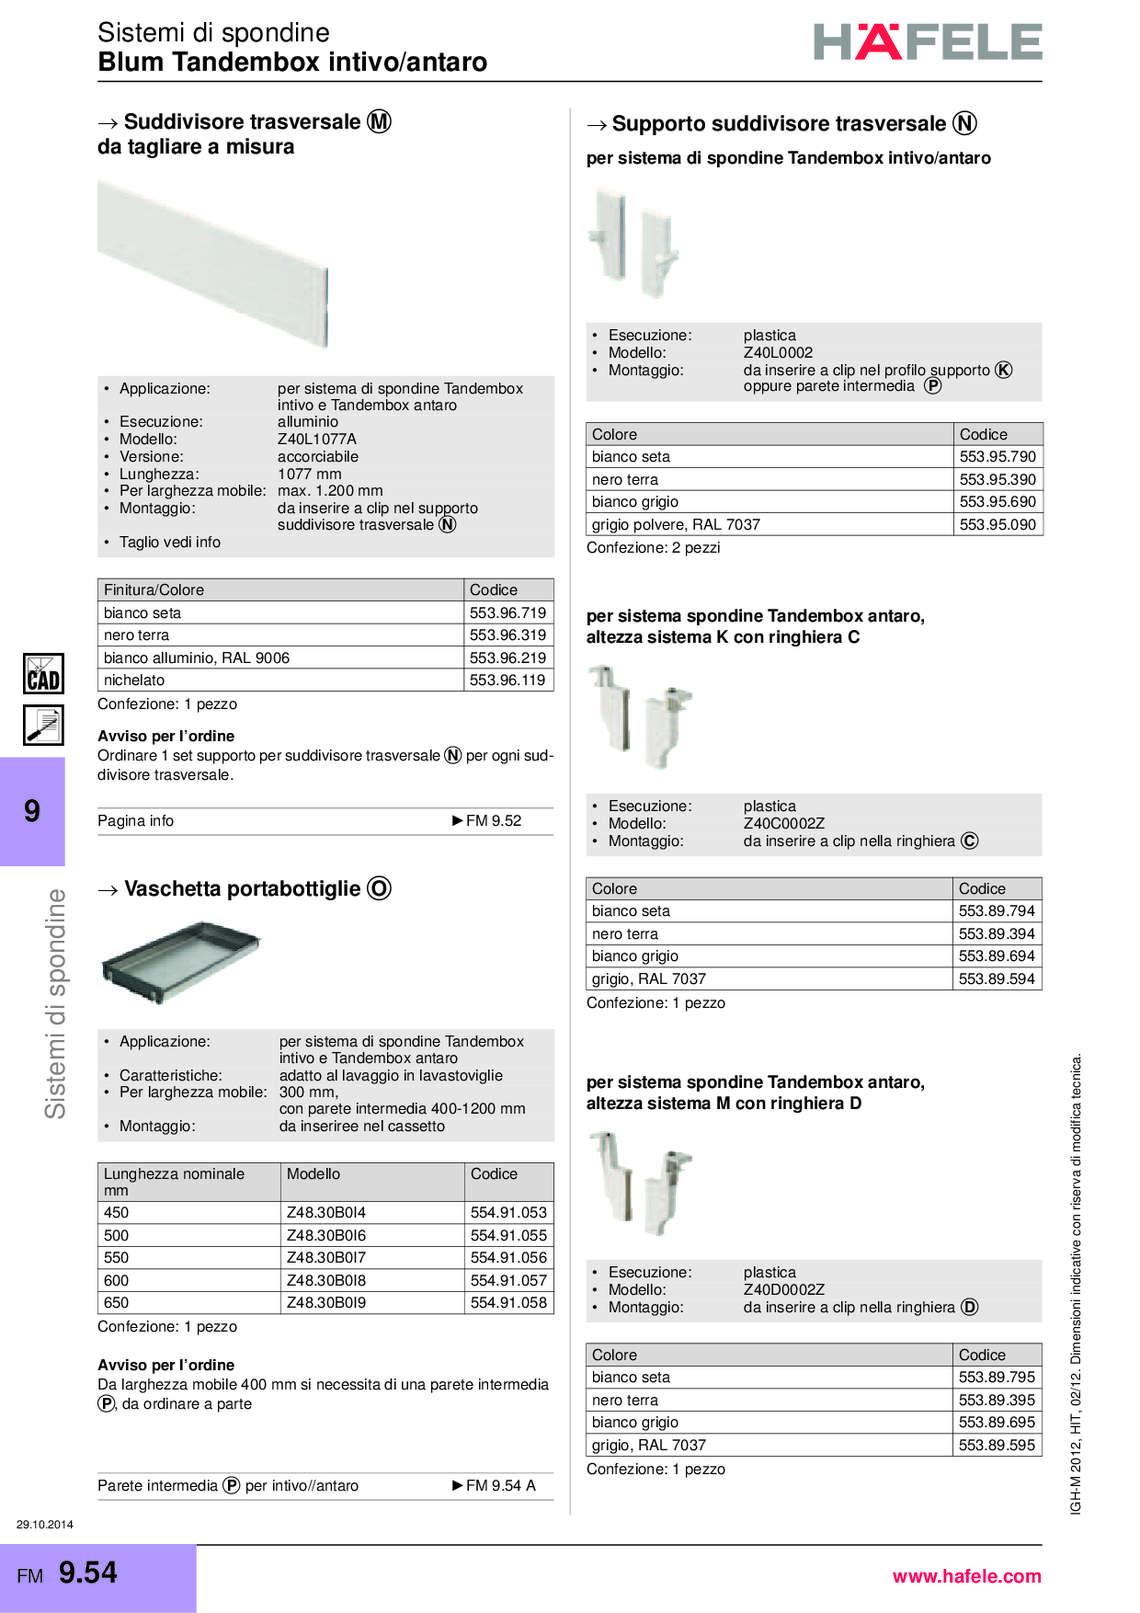 hafele-spondine-e-guide-per-mobili_40_065.jpg